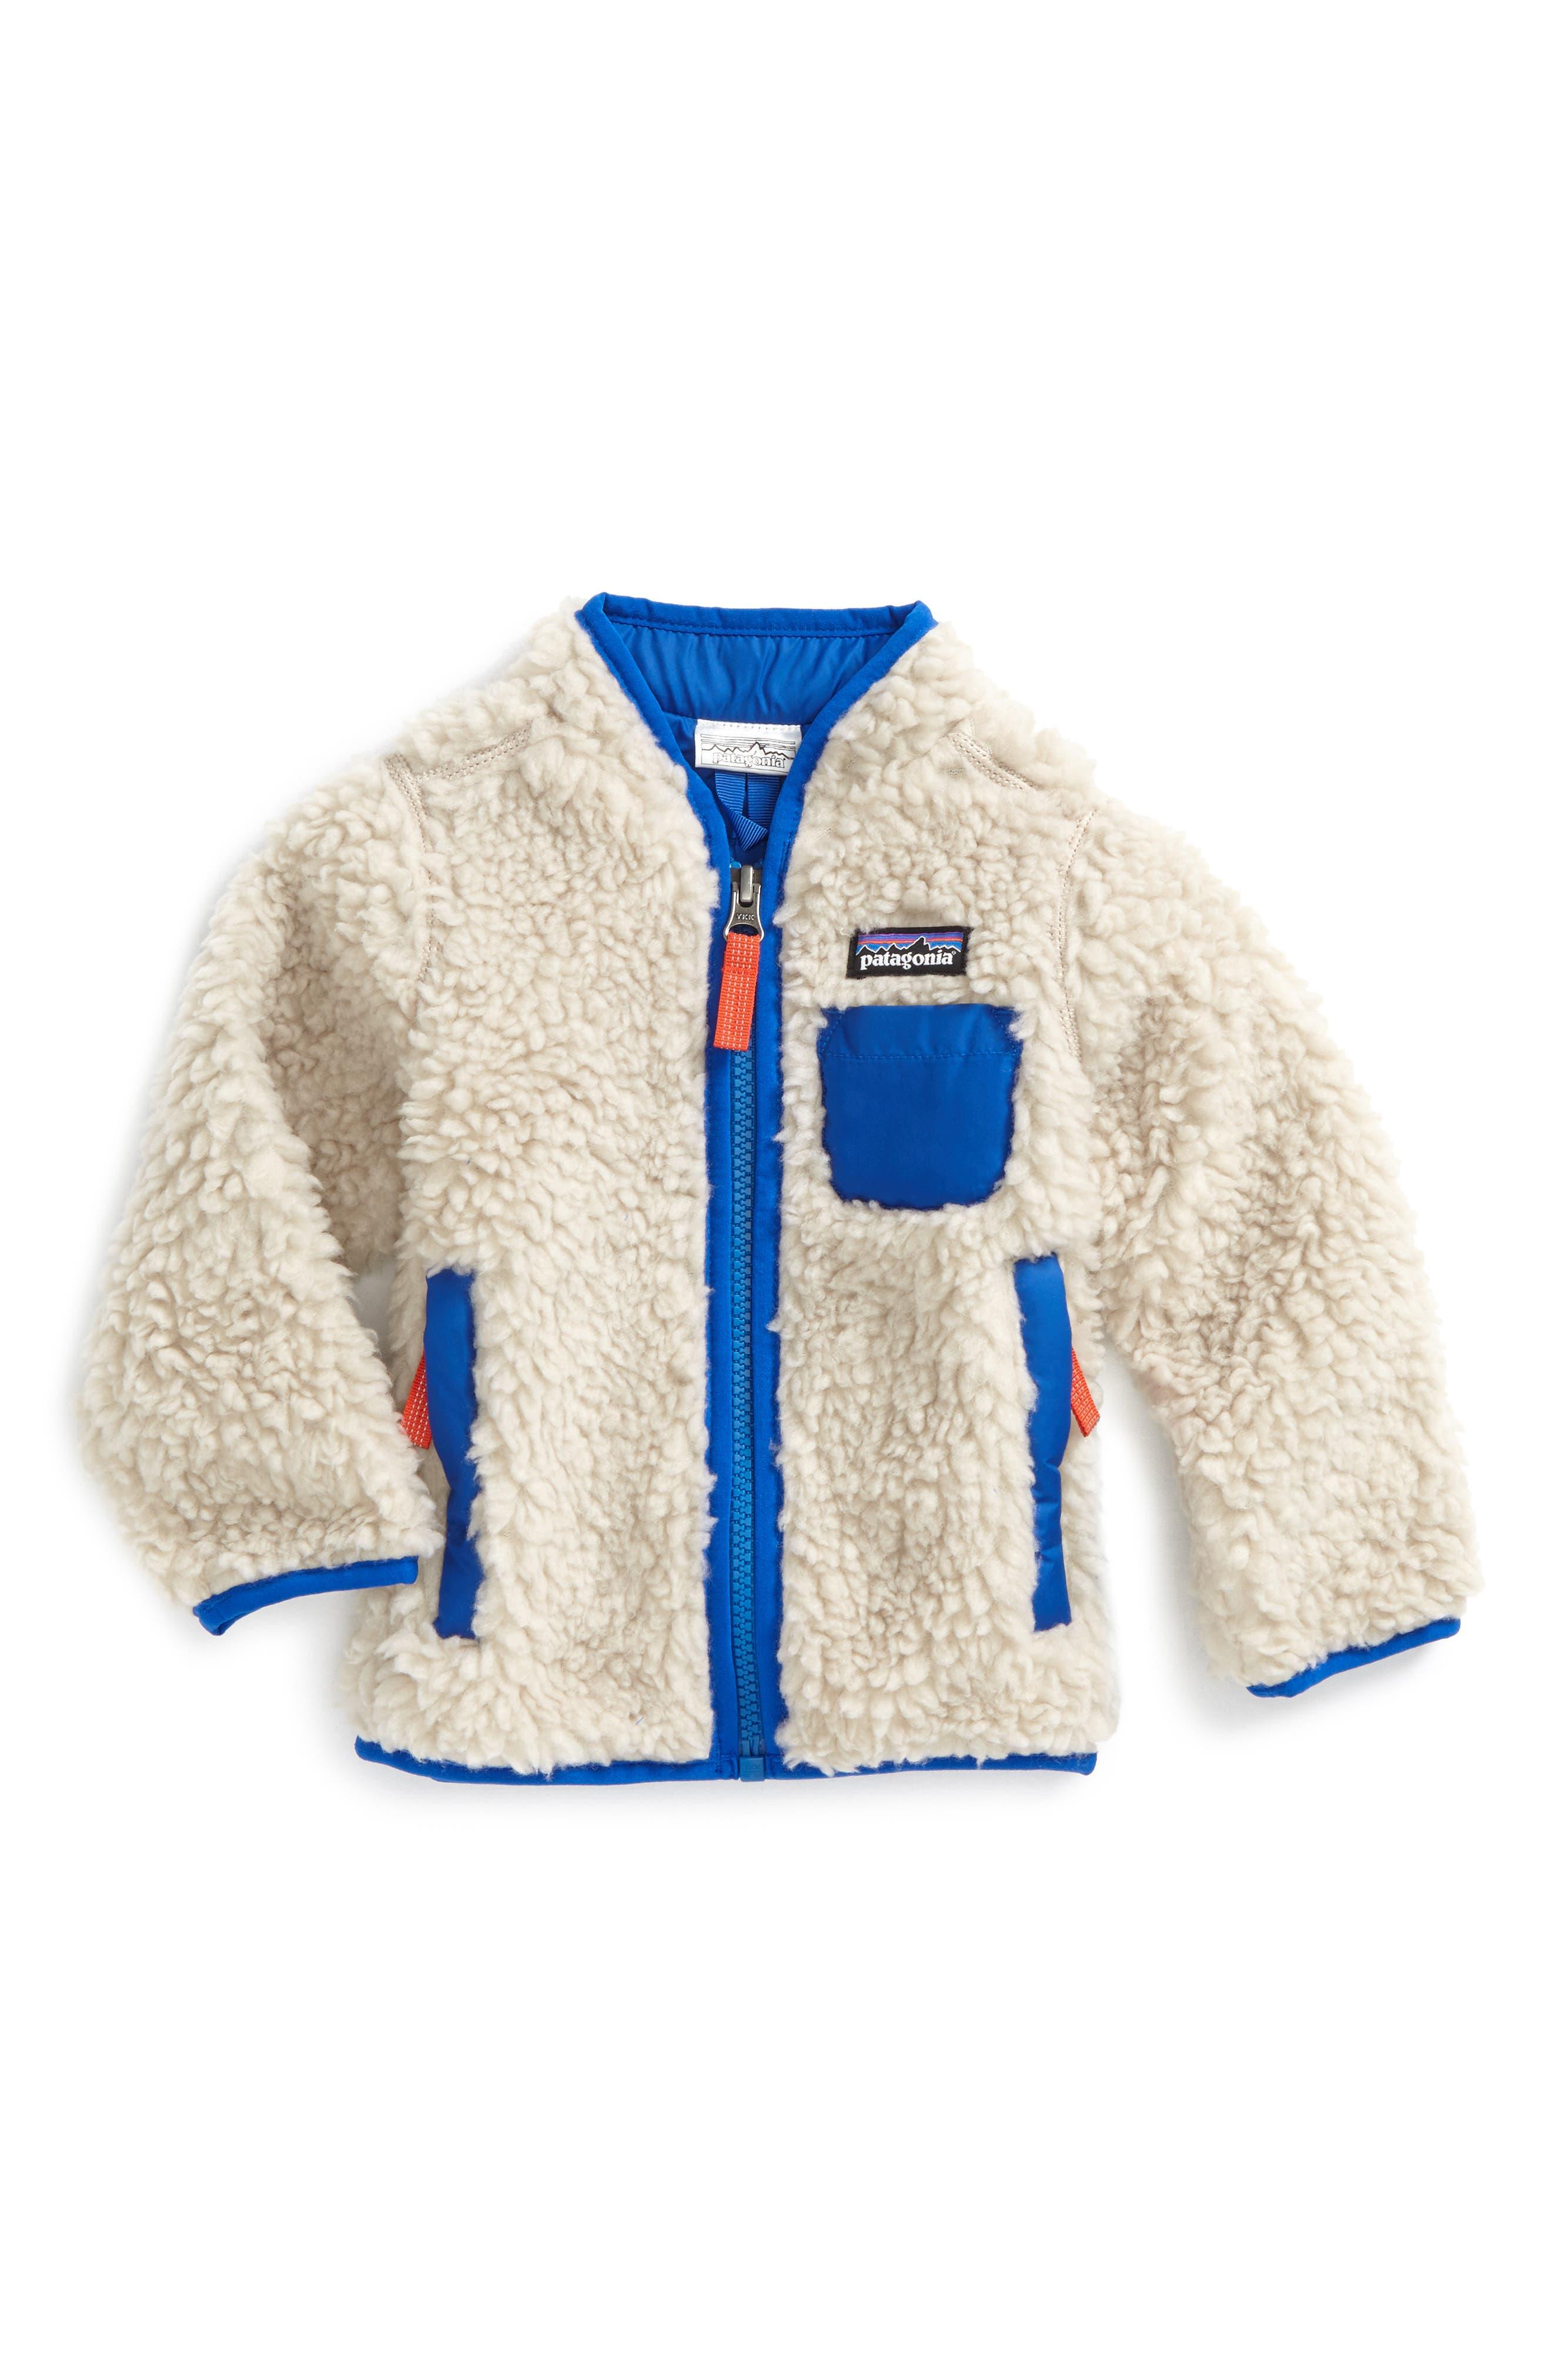 Main Image - Patagonia Retro-X Windproof Jacket (Baby Boys)